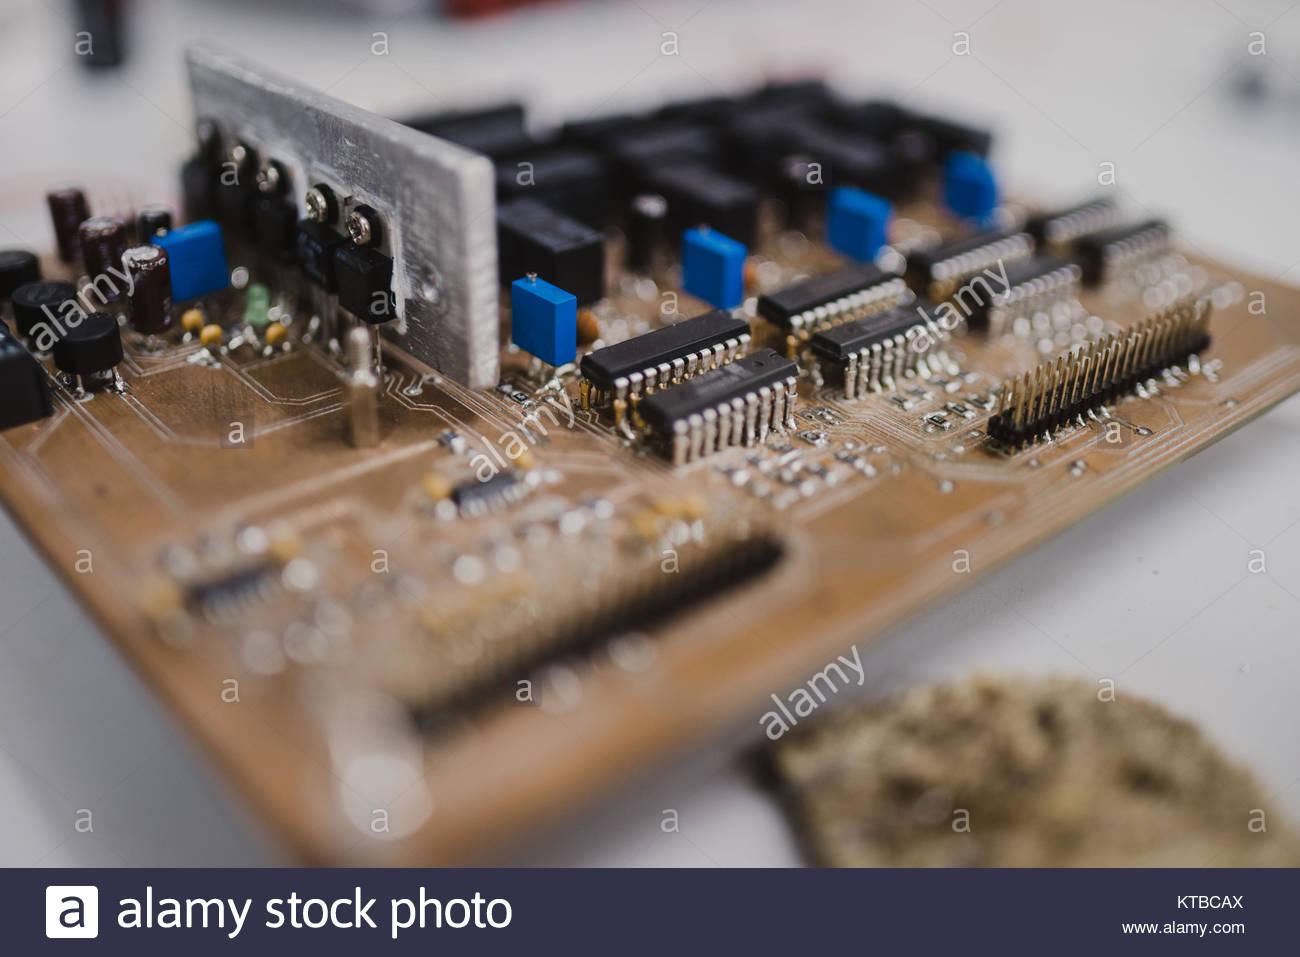 Electronics Breadboard Stock Photos & Electronics Breadboard Stock ...